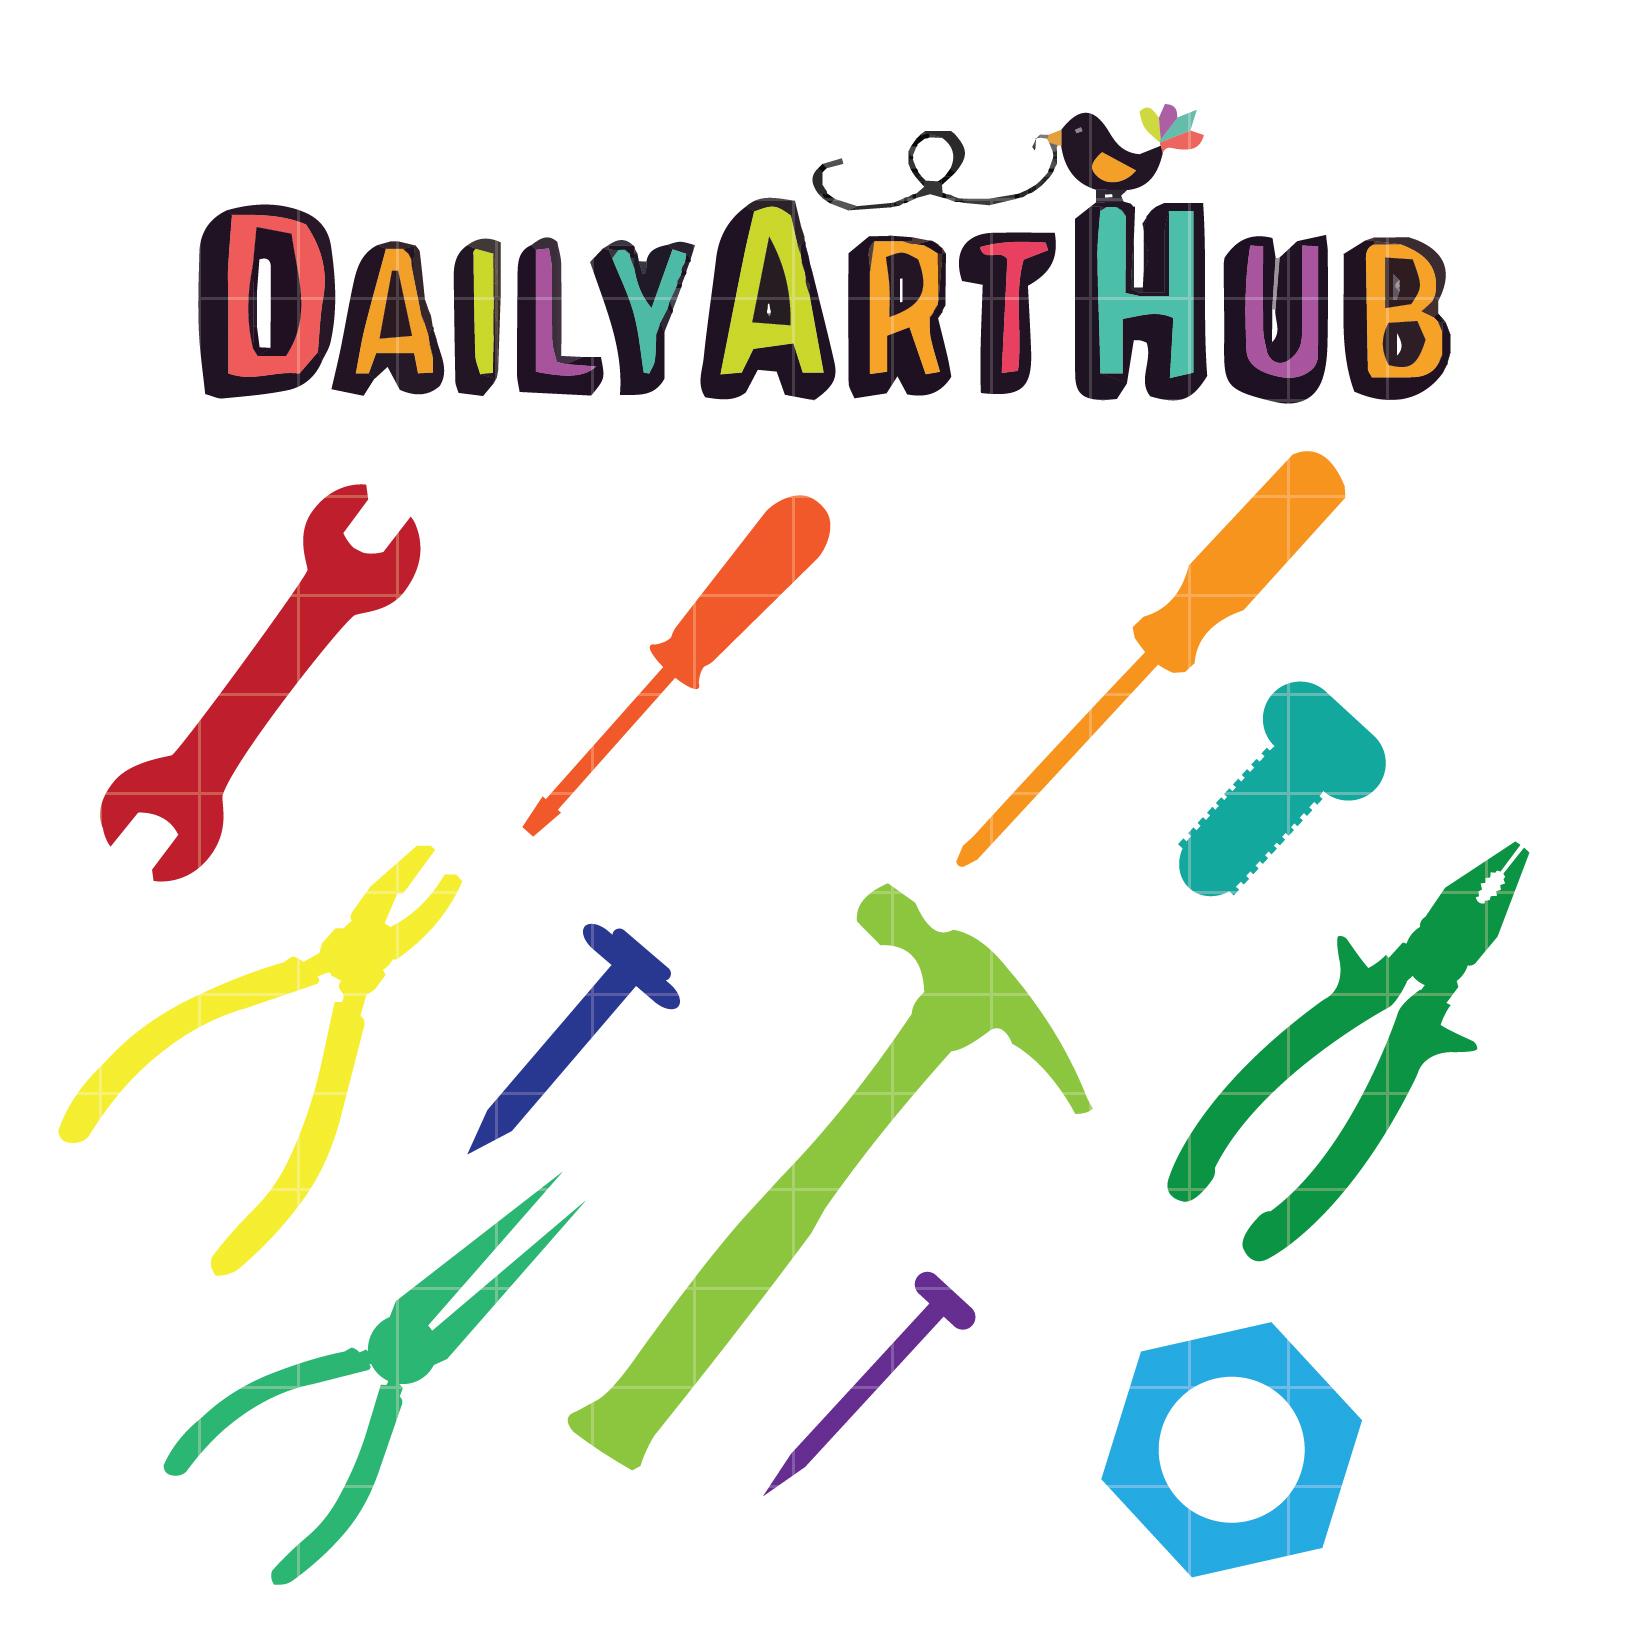 1650x1650 Colorful Tools Clip Art Set Daily Art Hub Free Clip Art Everyday